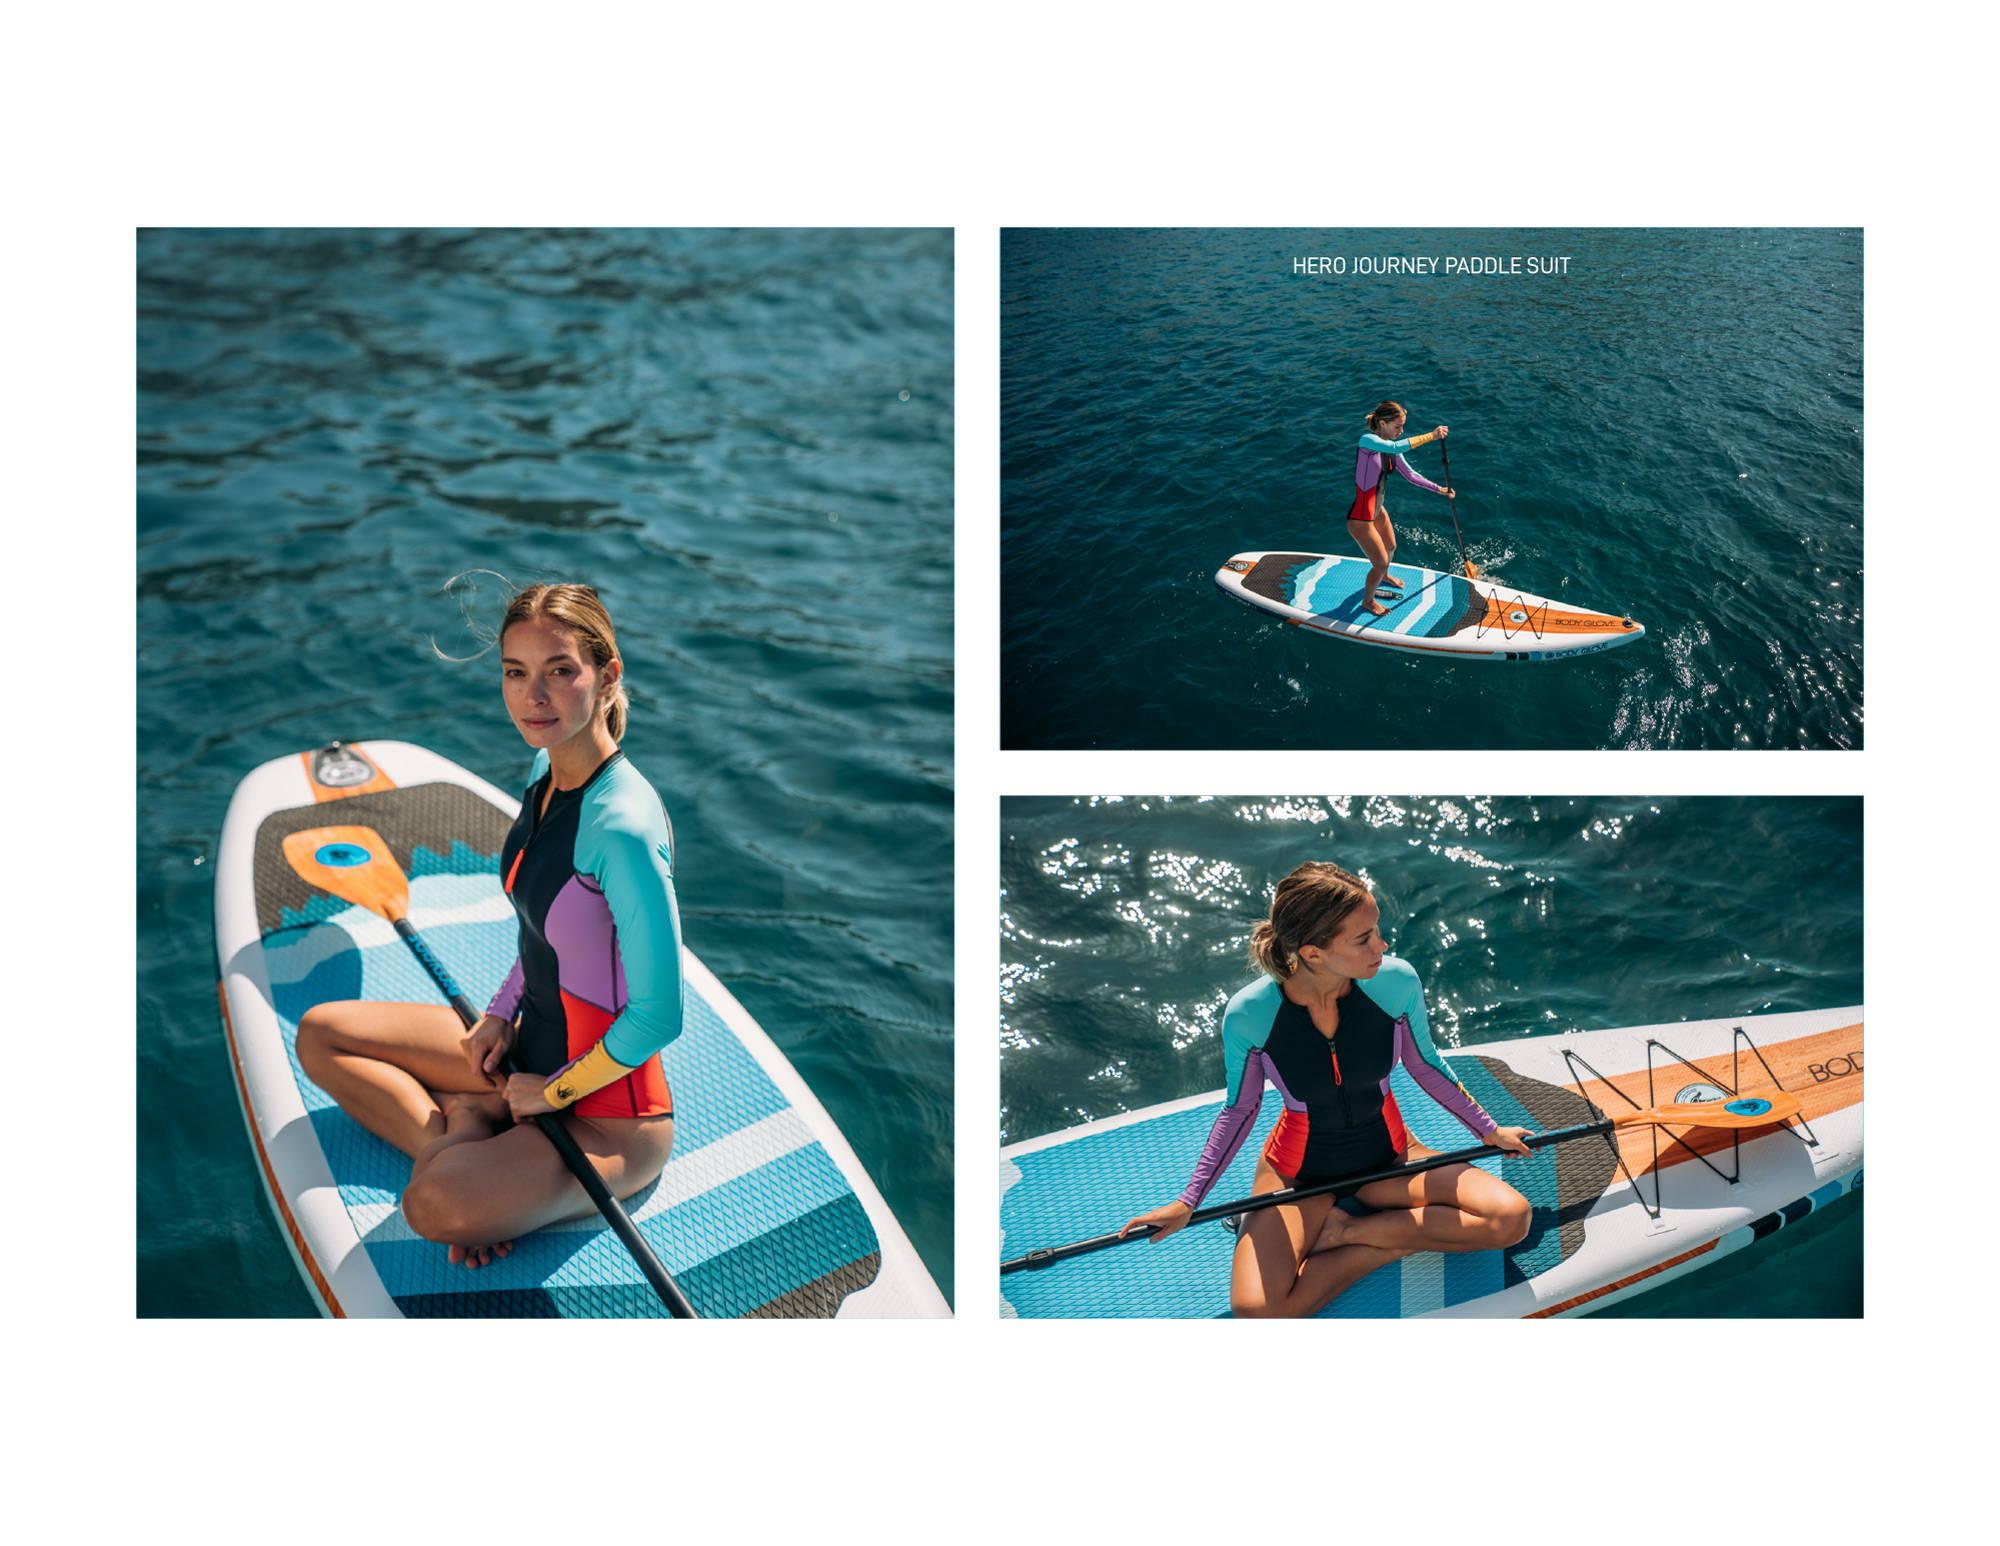 Hero Journey Paddle Suit